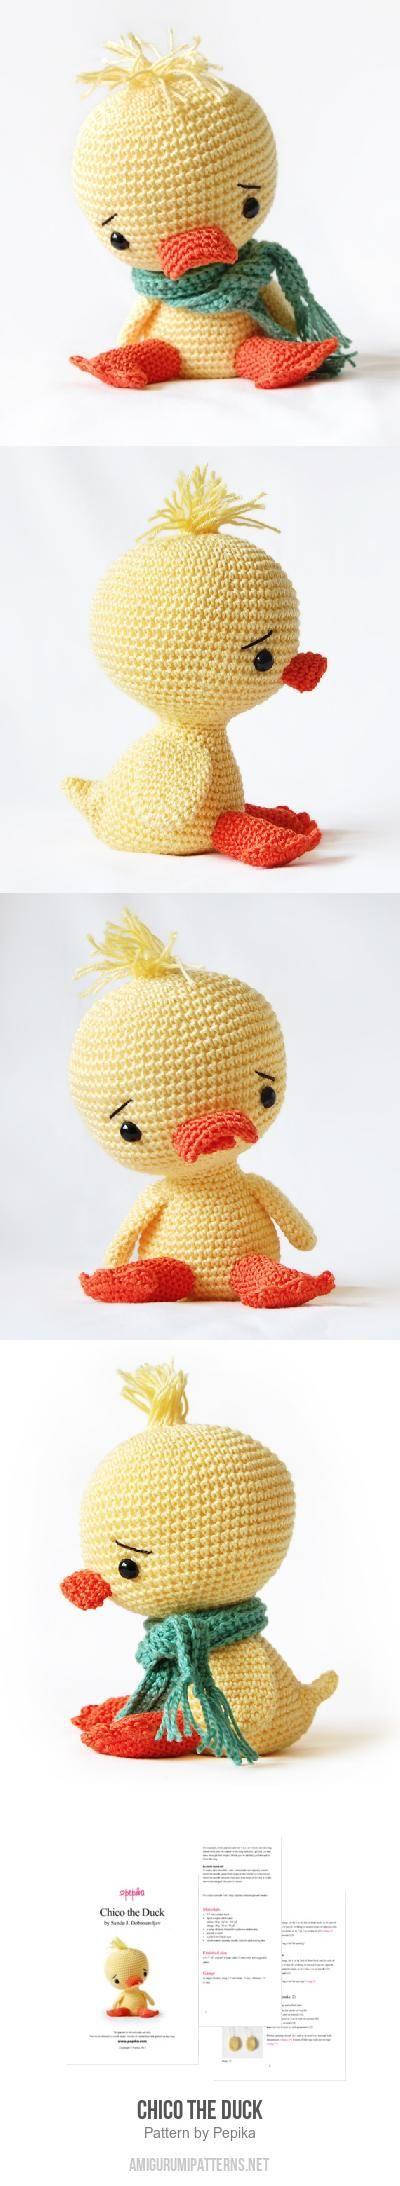 Chico the Duck amigurumi pattern